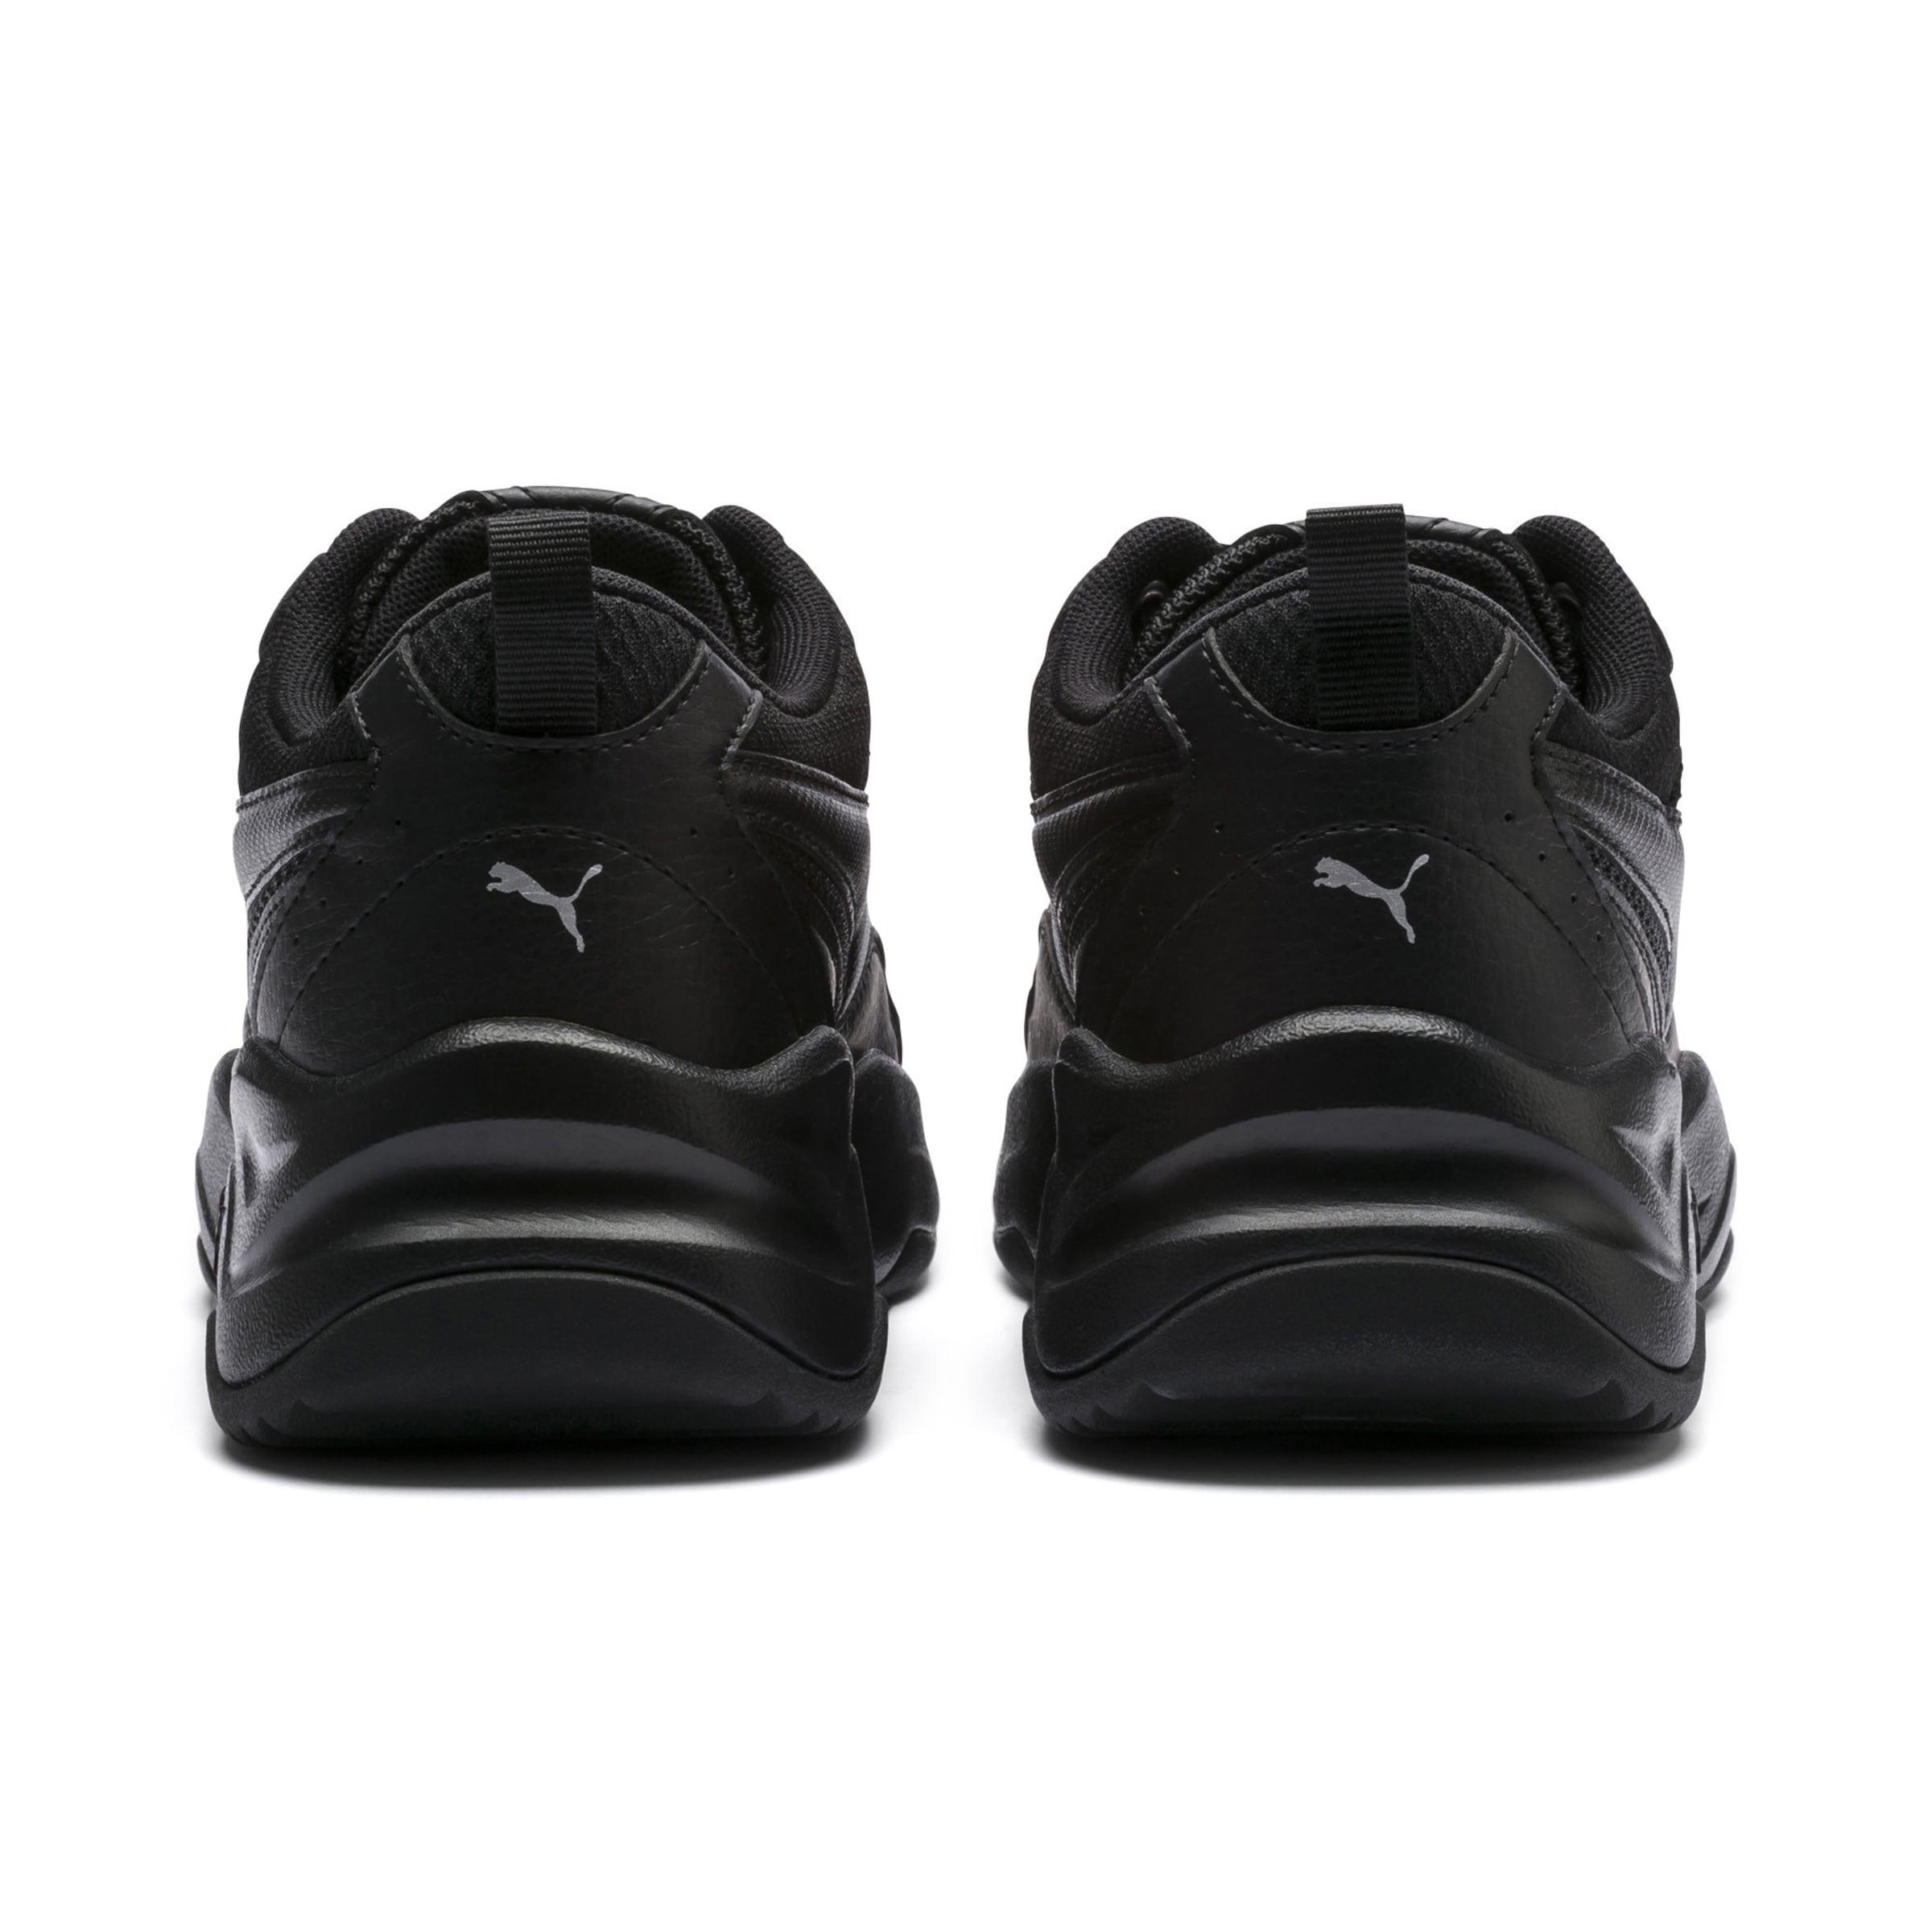 'cilia' Puma En Baskets Basses Noir Nnm0wv8